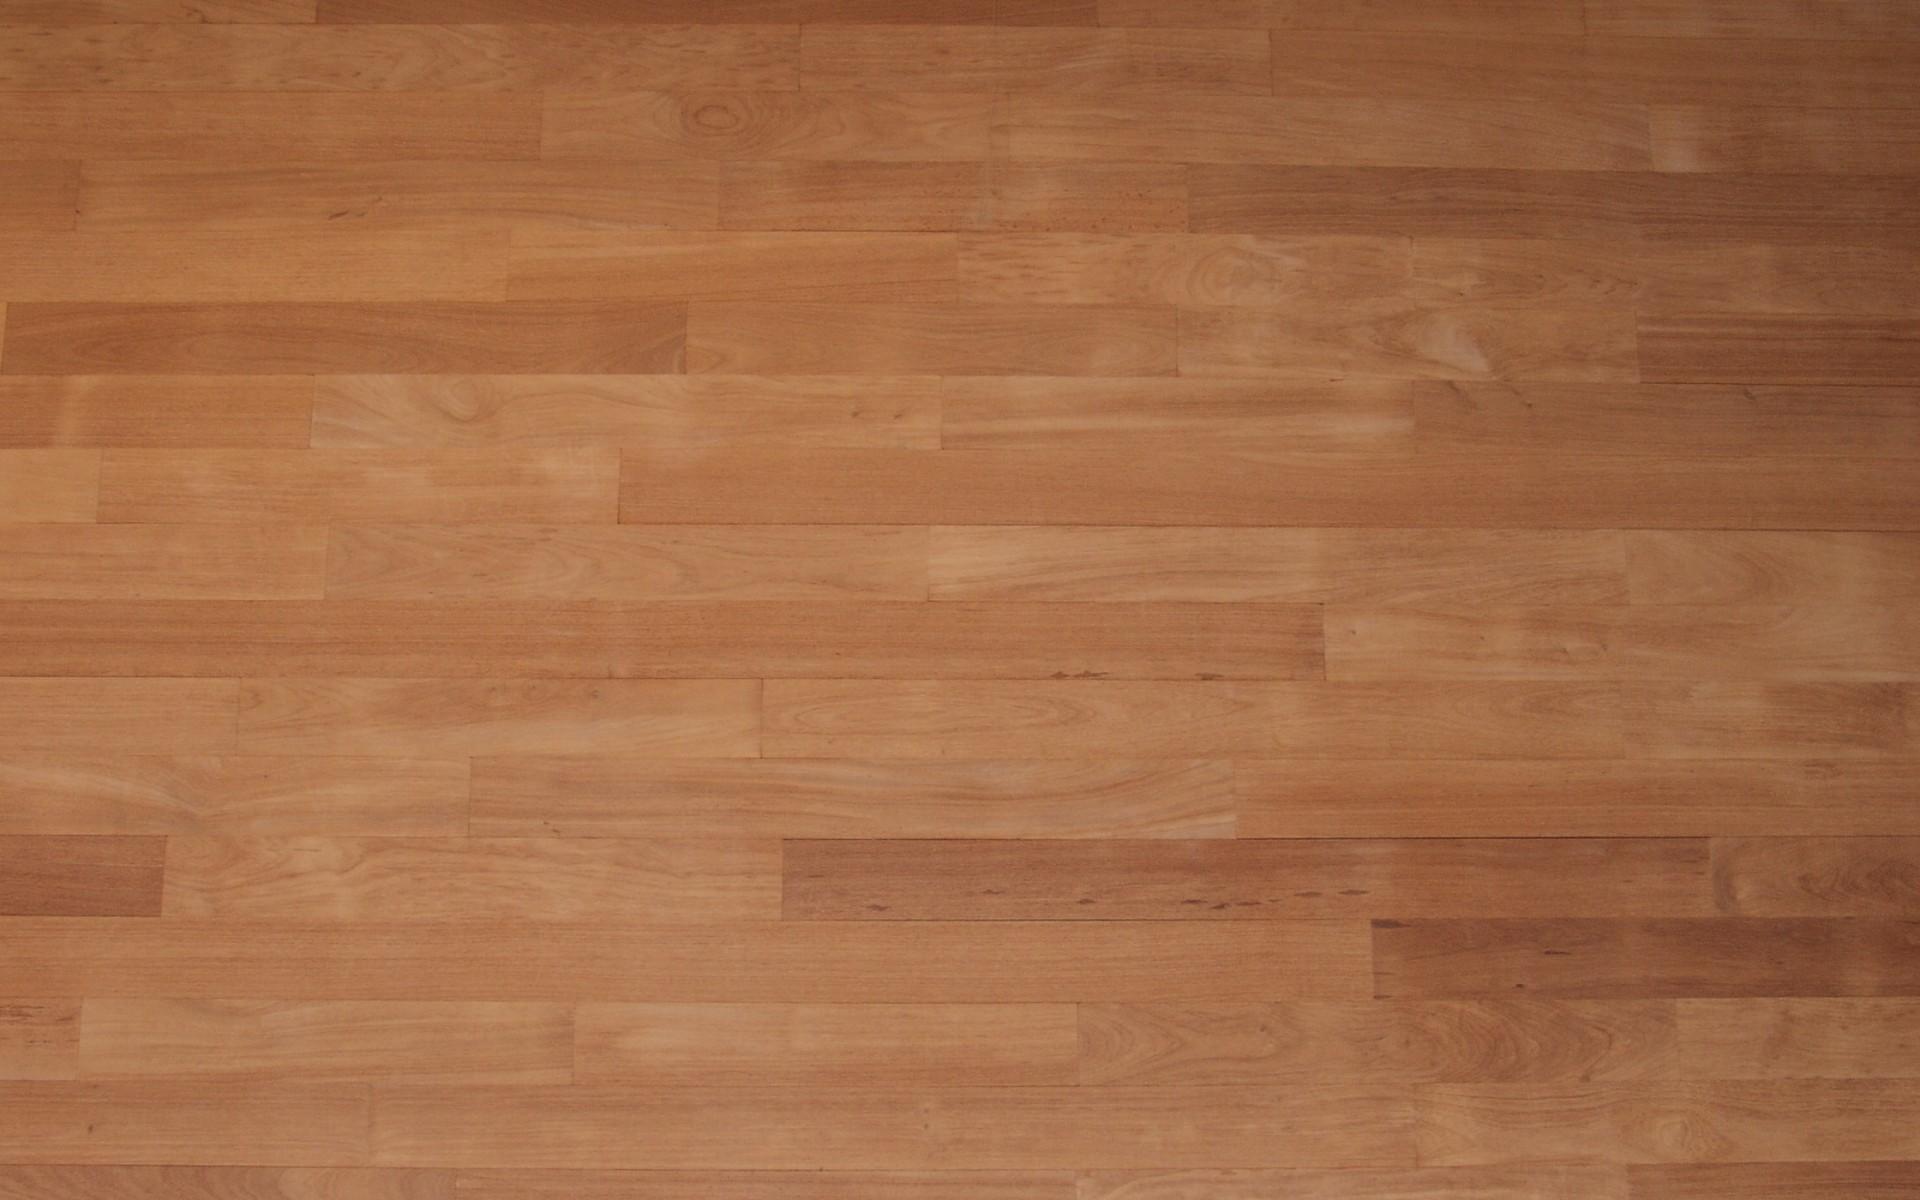 Wood Flooring Texture